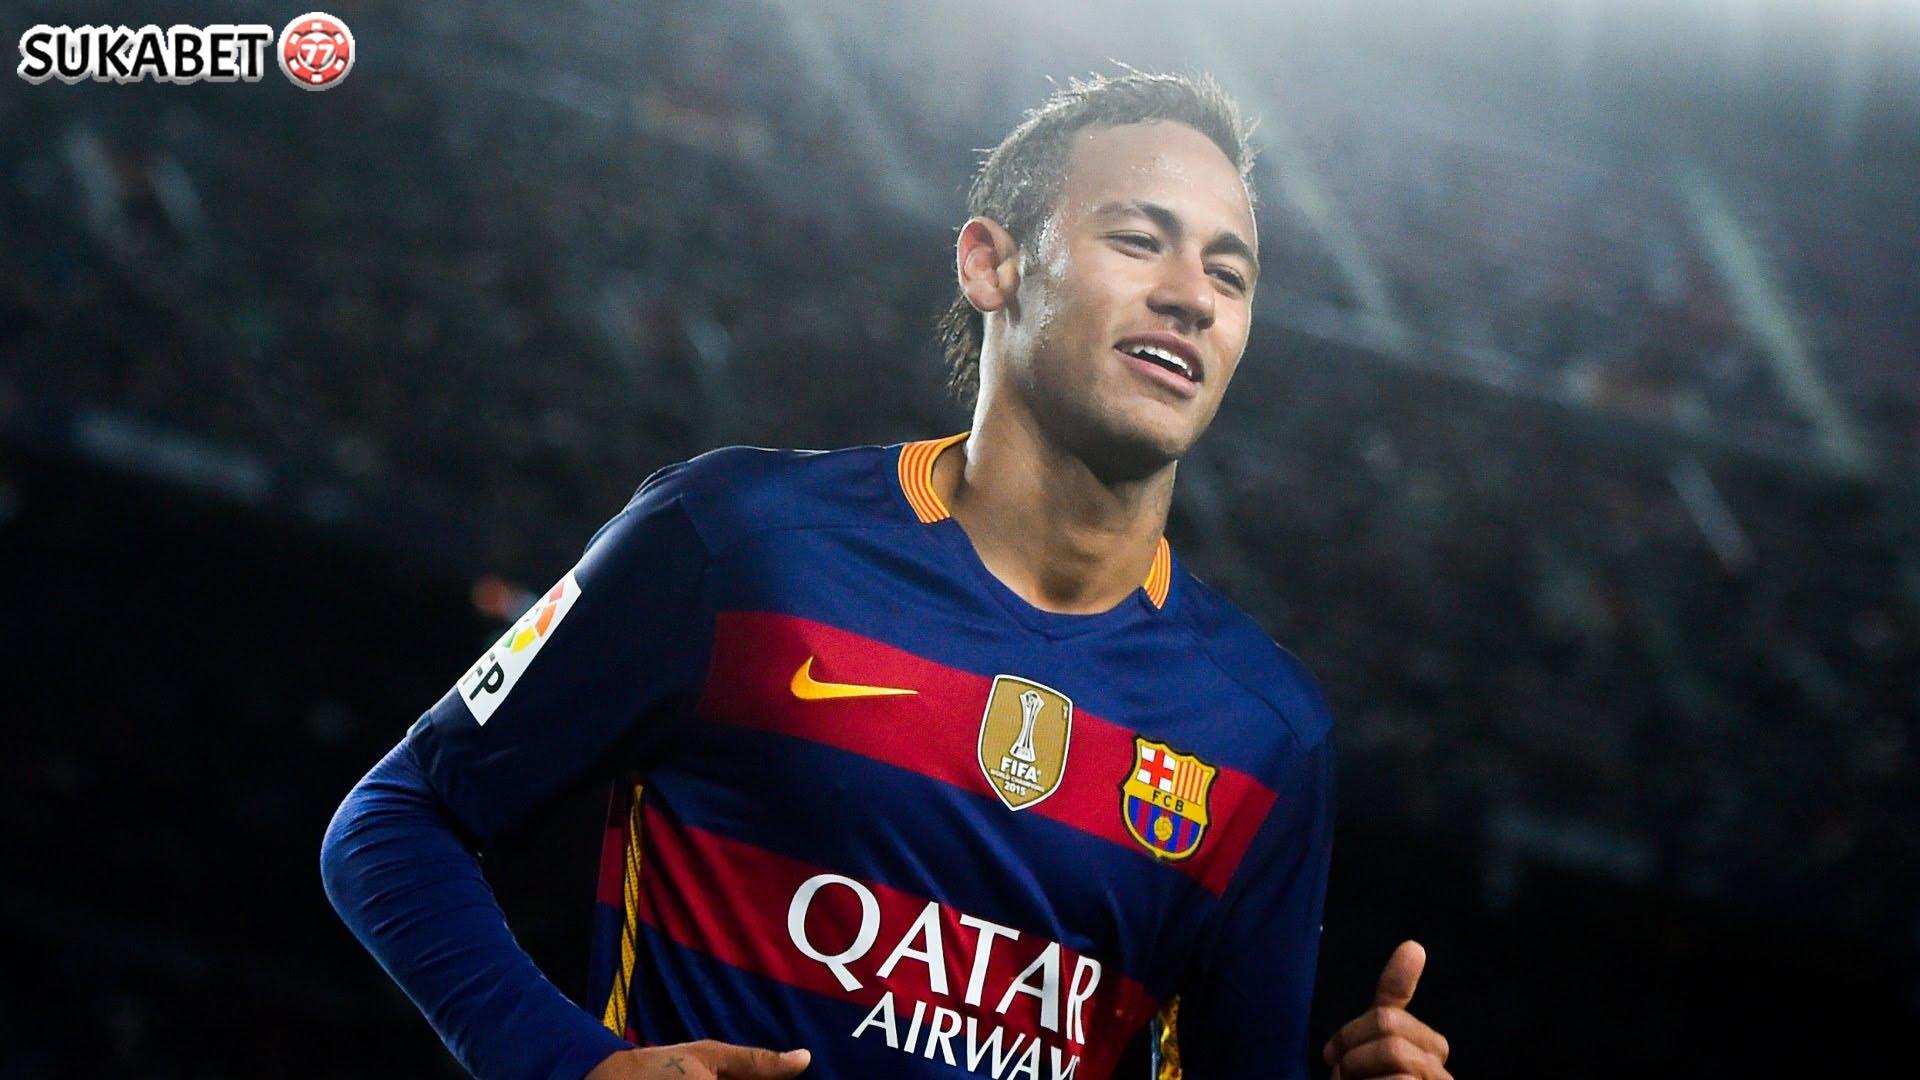 Barca Bisa Lapor PSG Terkait Pelanggaran Financial Fair Play